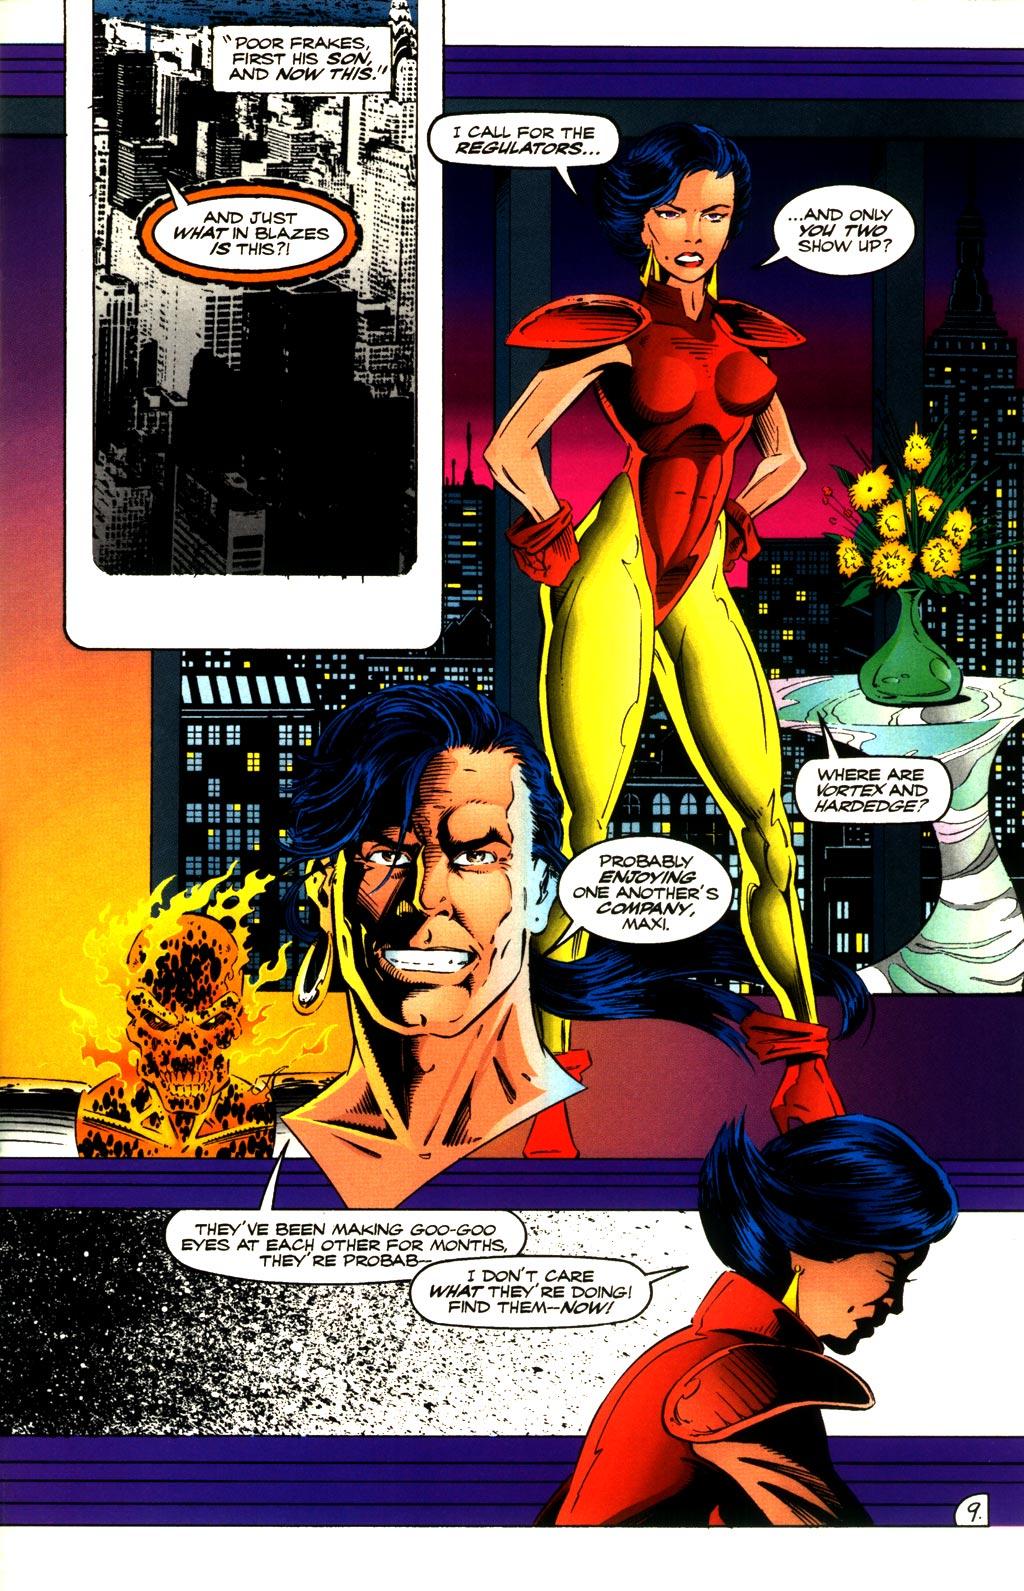 Read online ShadowHawk comic -  Issue #8 - 9